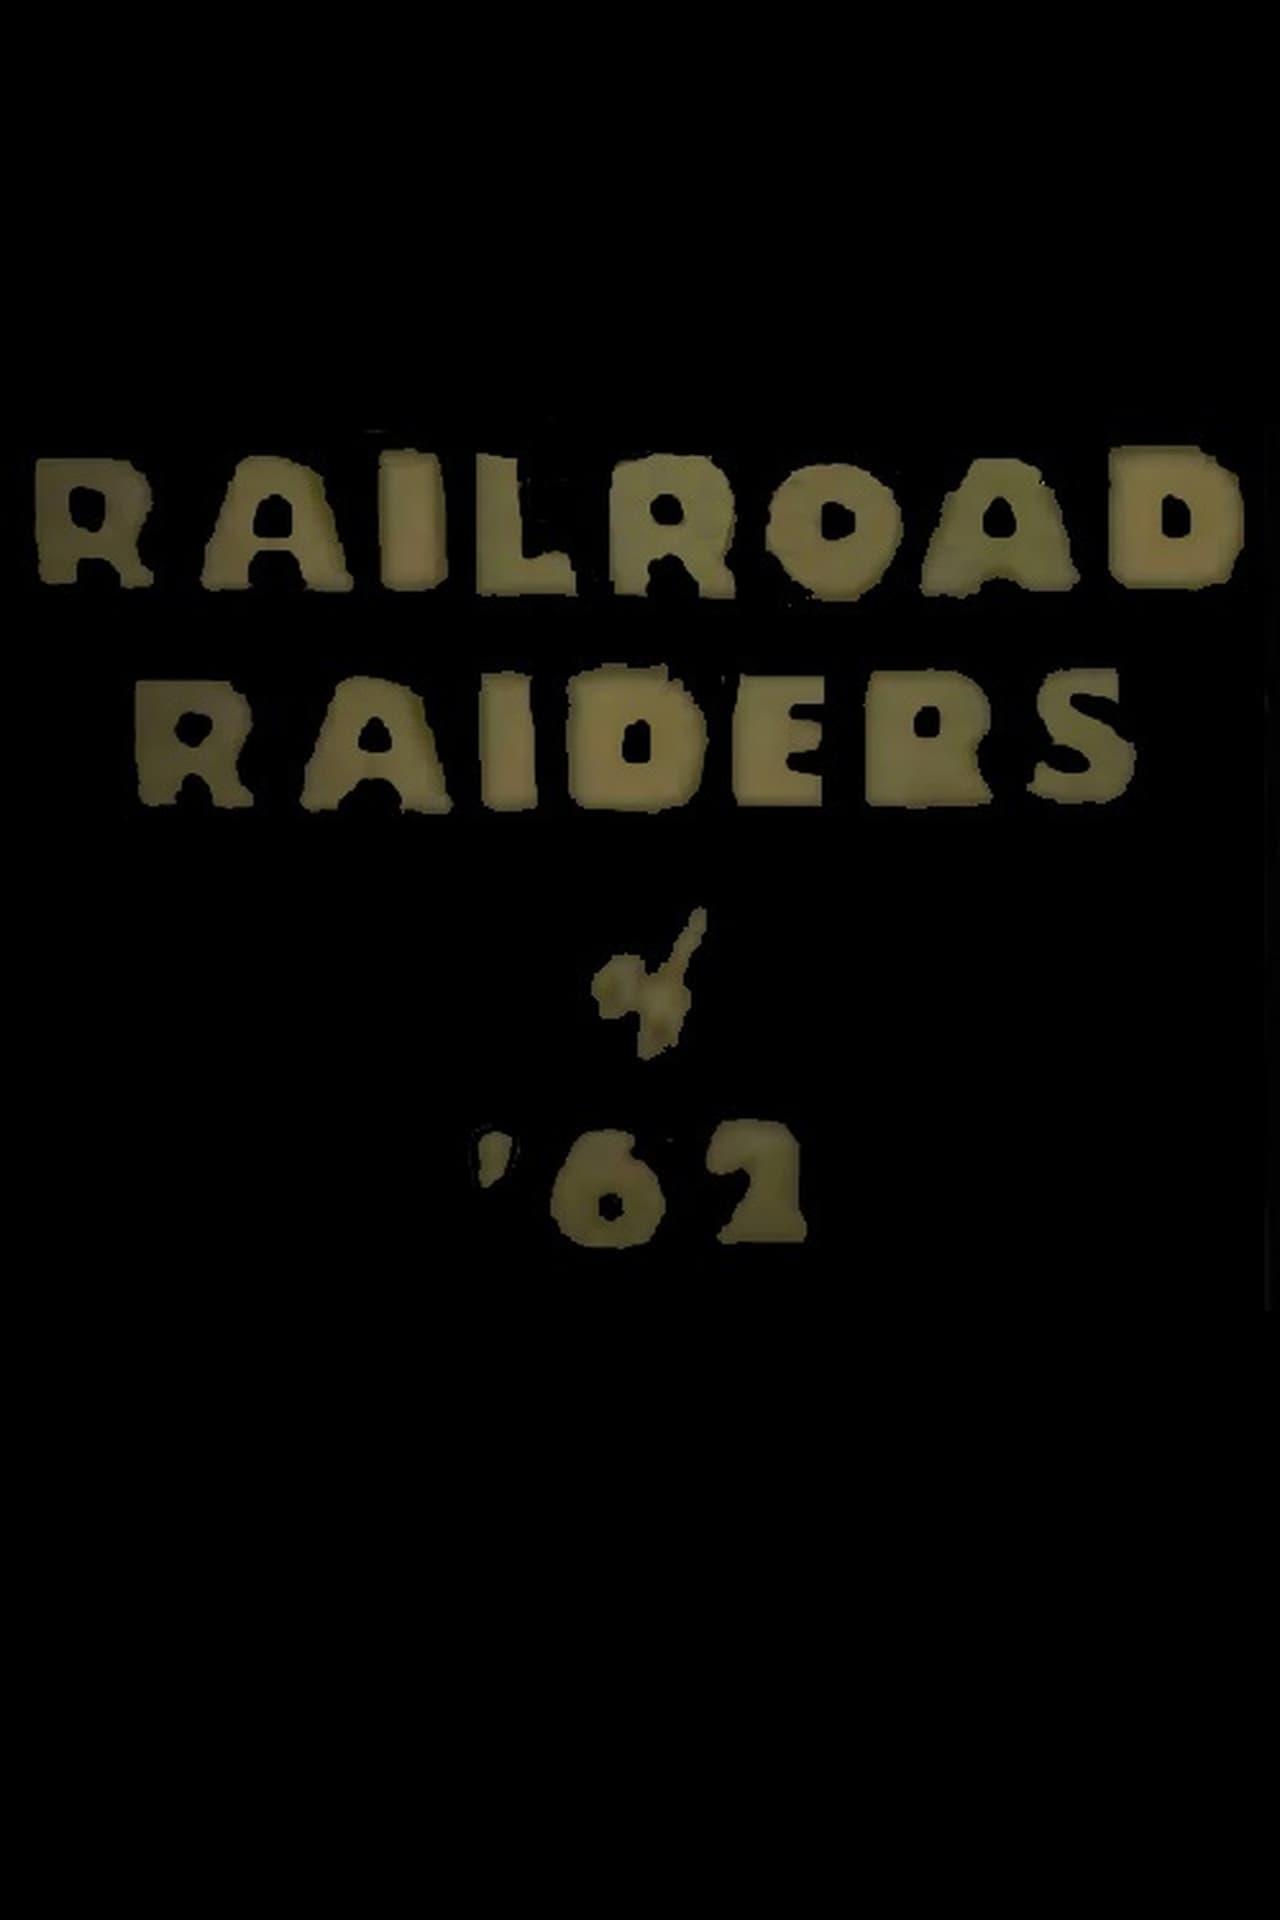 Railroad Raiders of '62